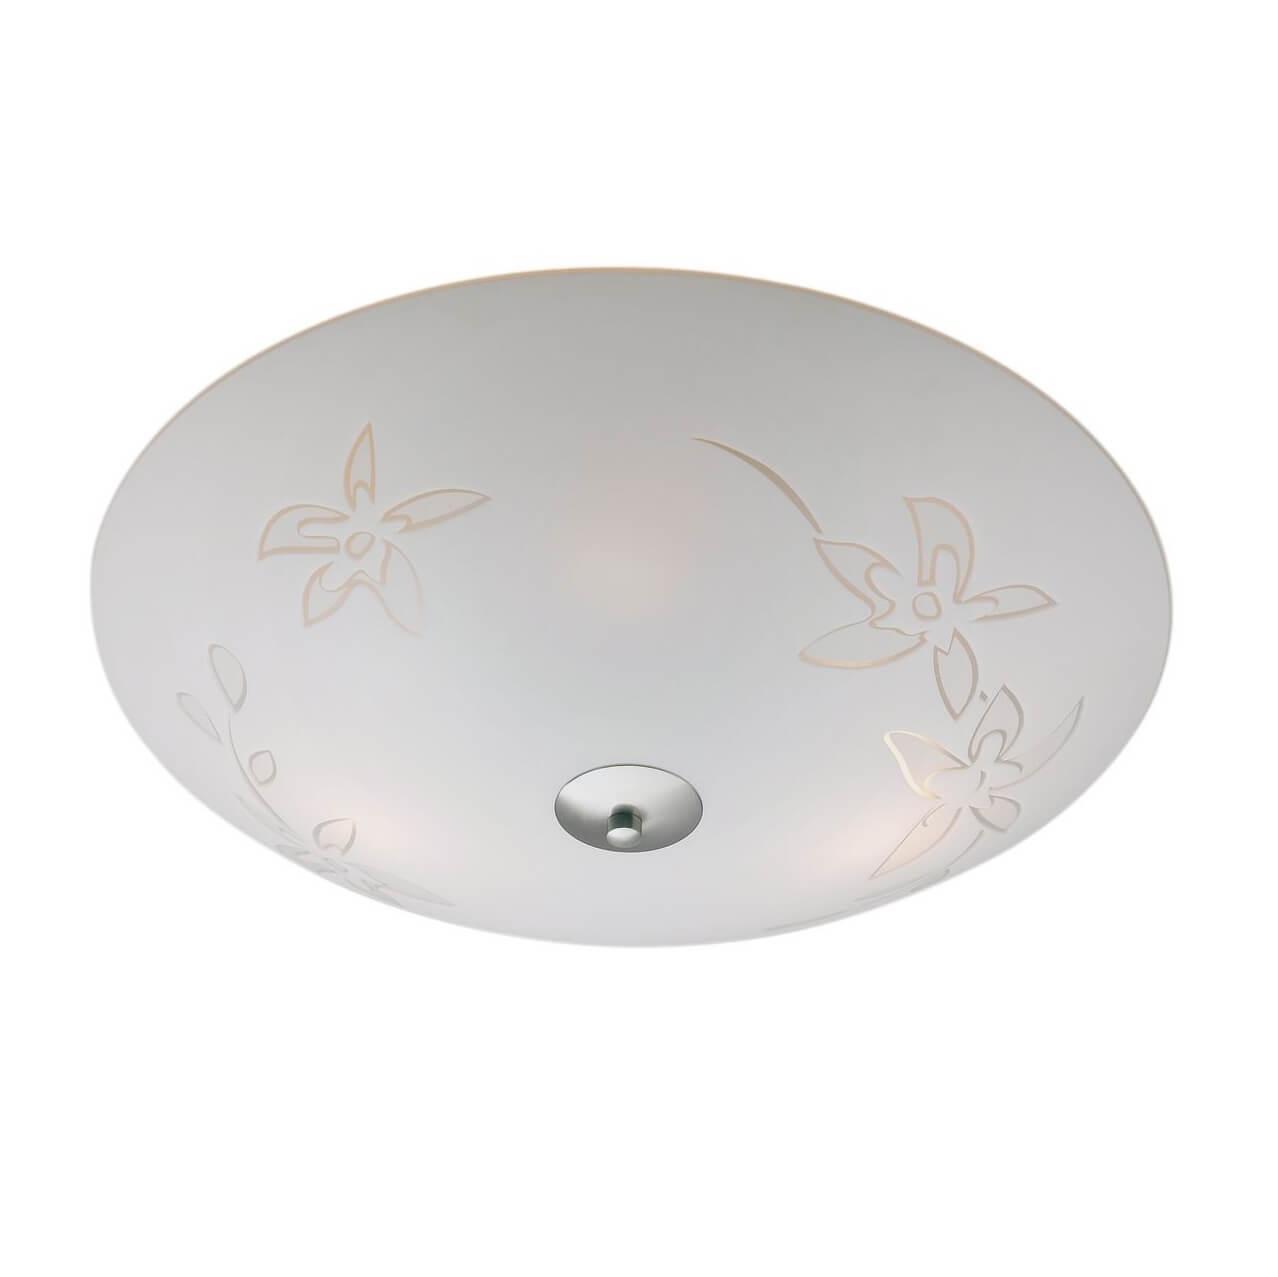 Накладной светильник MarkSLojd 183341-494212, E14, 40 Вт цена